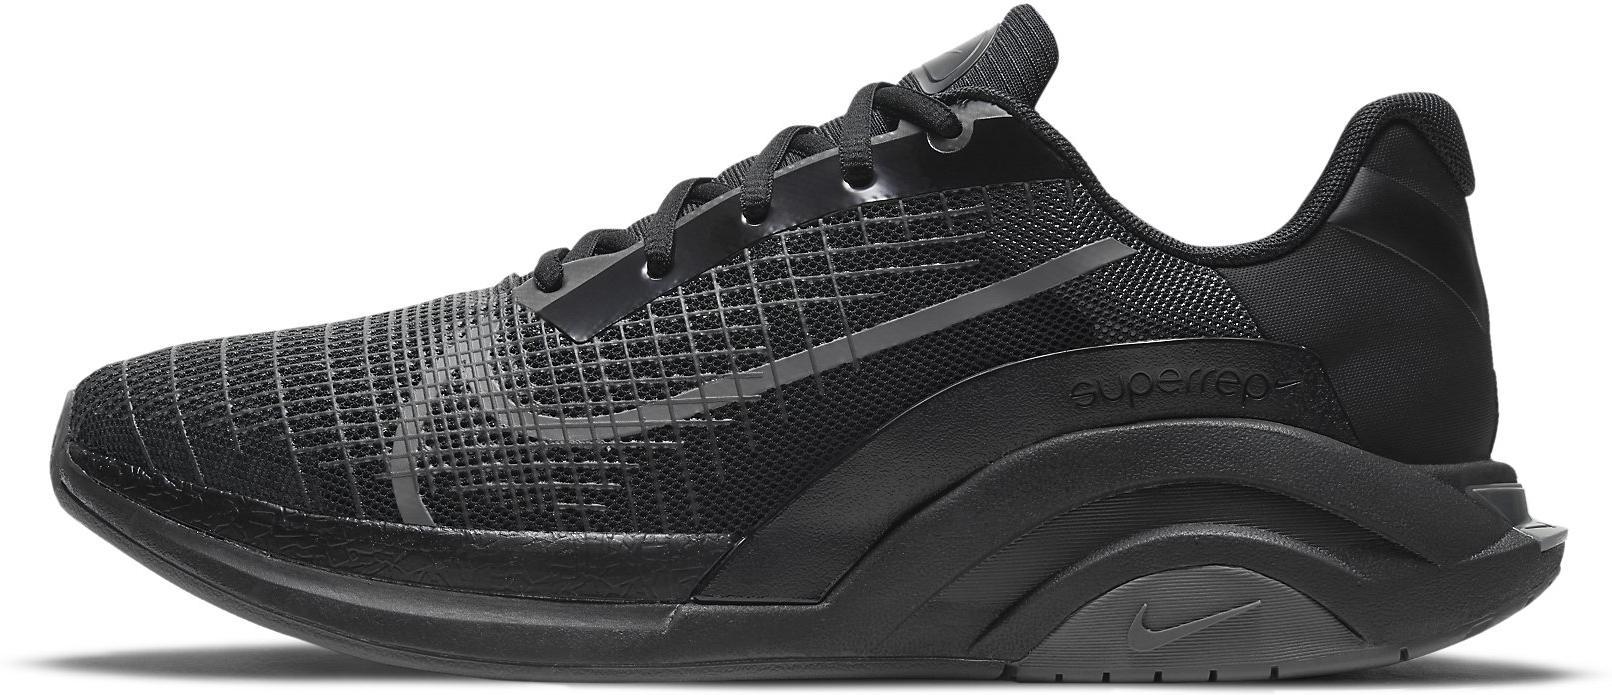 Zapatillas de fitness Nike ZOOMX SUPERREP SURGE